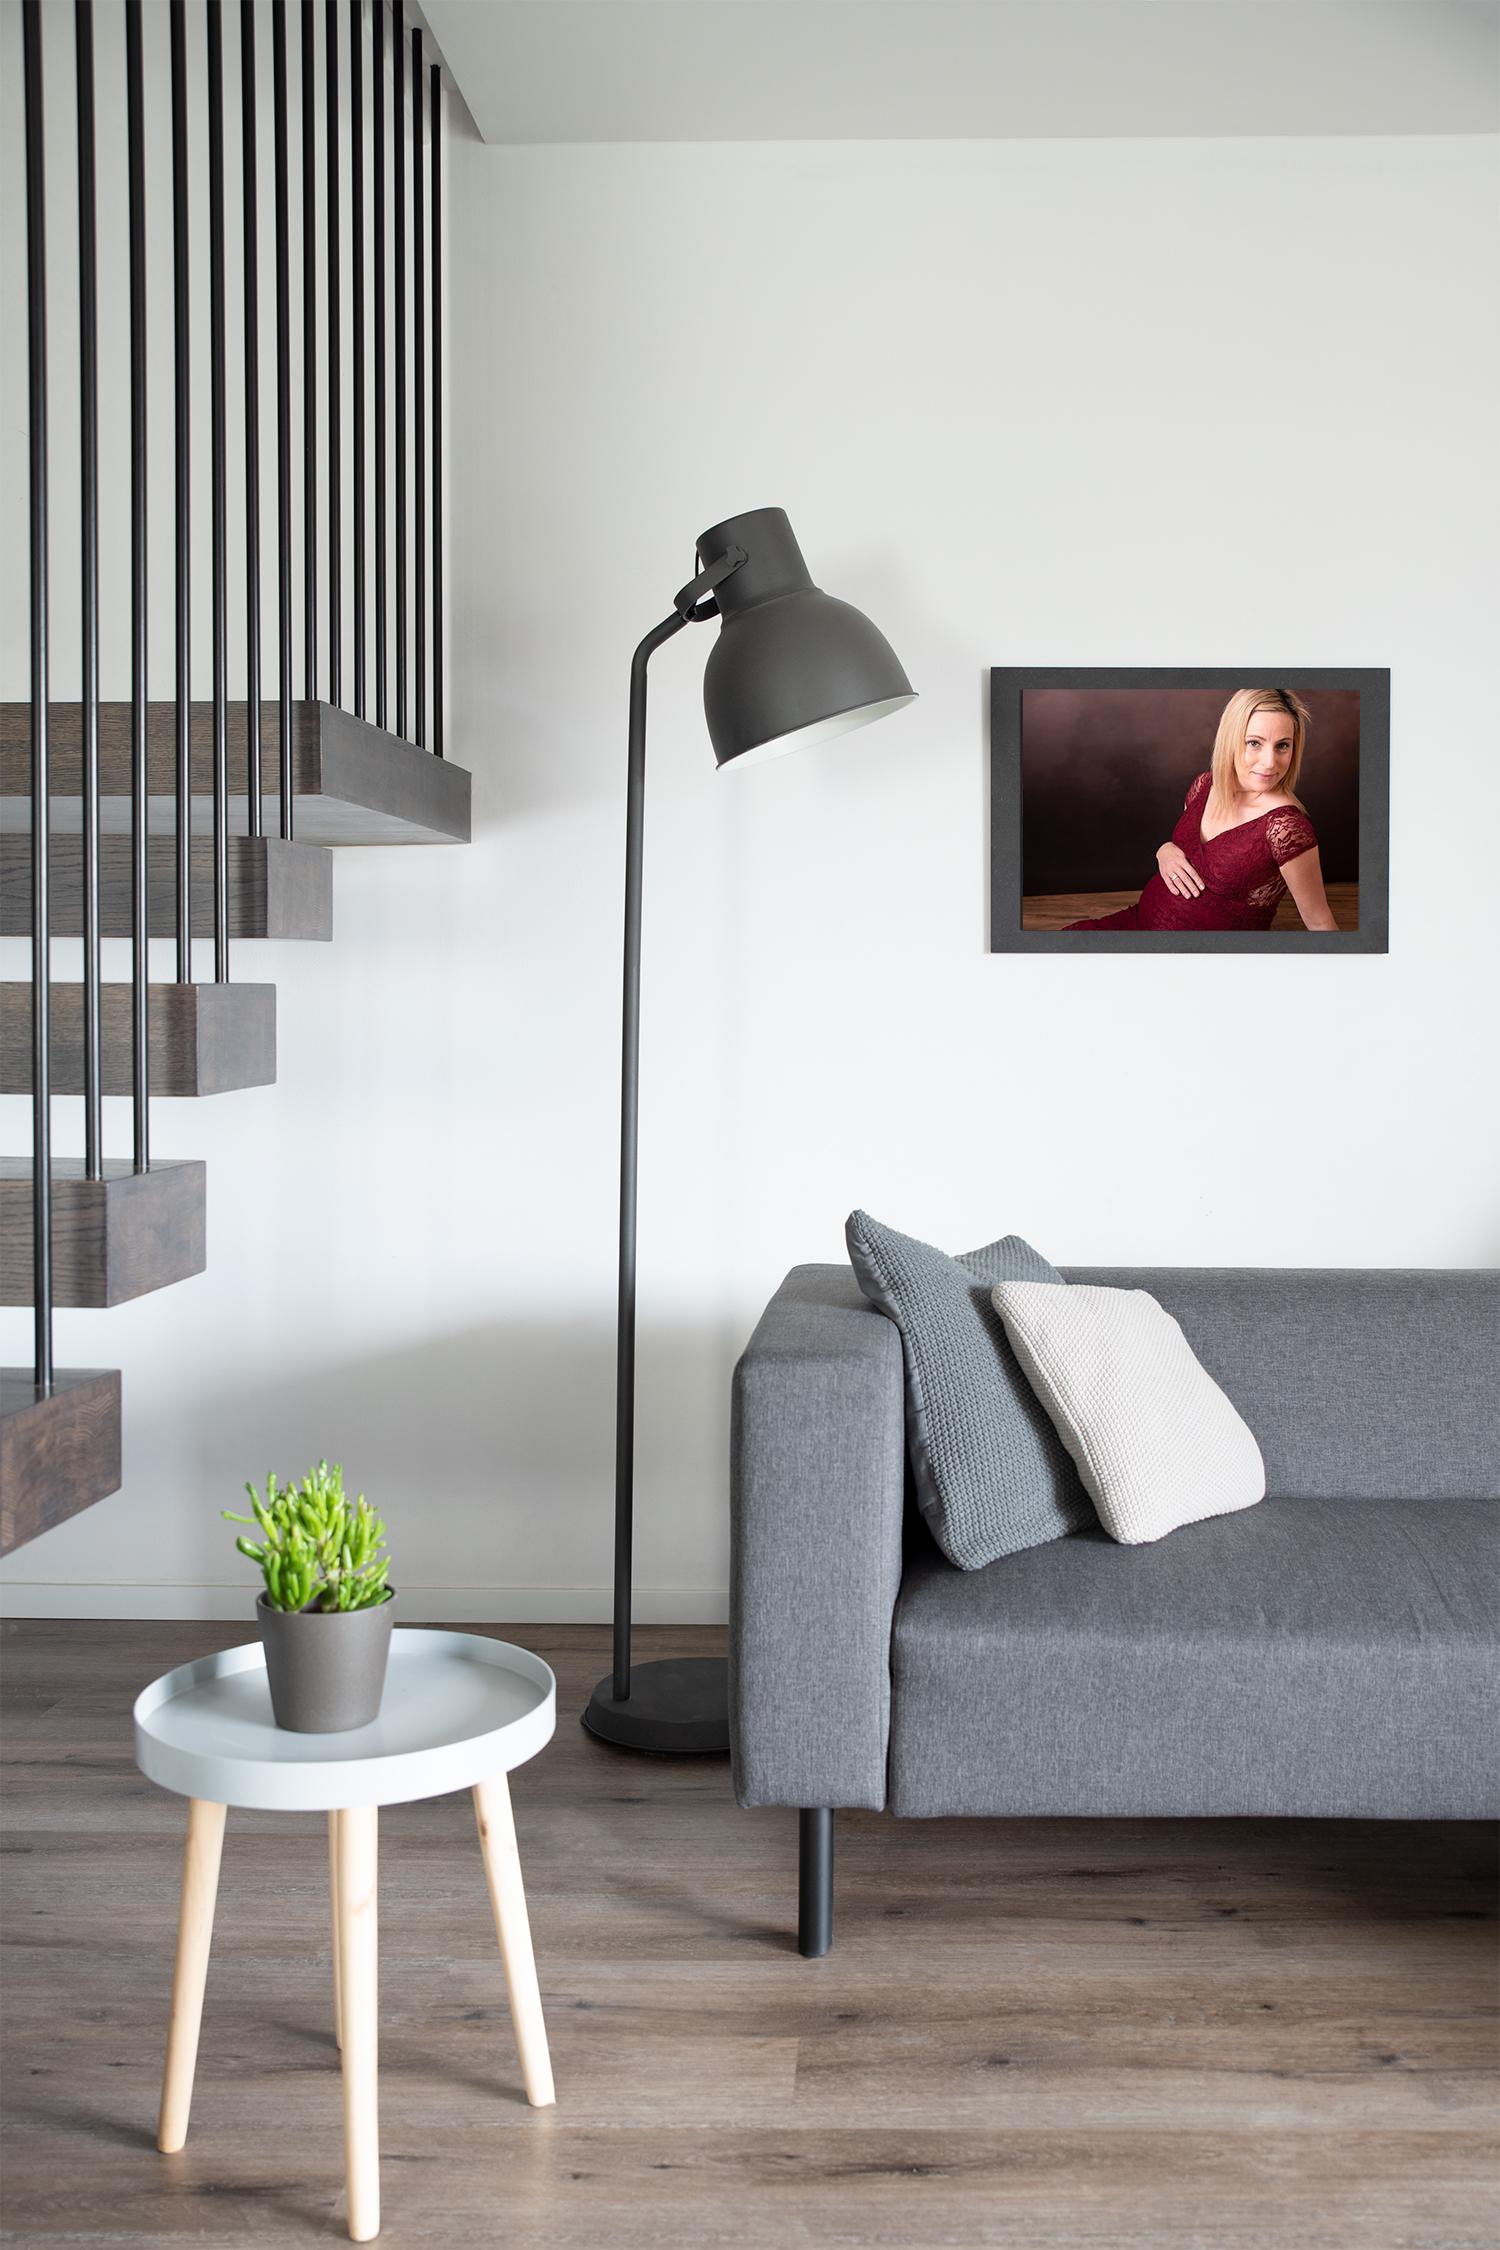 sample image of wall art